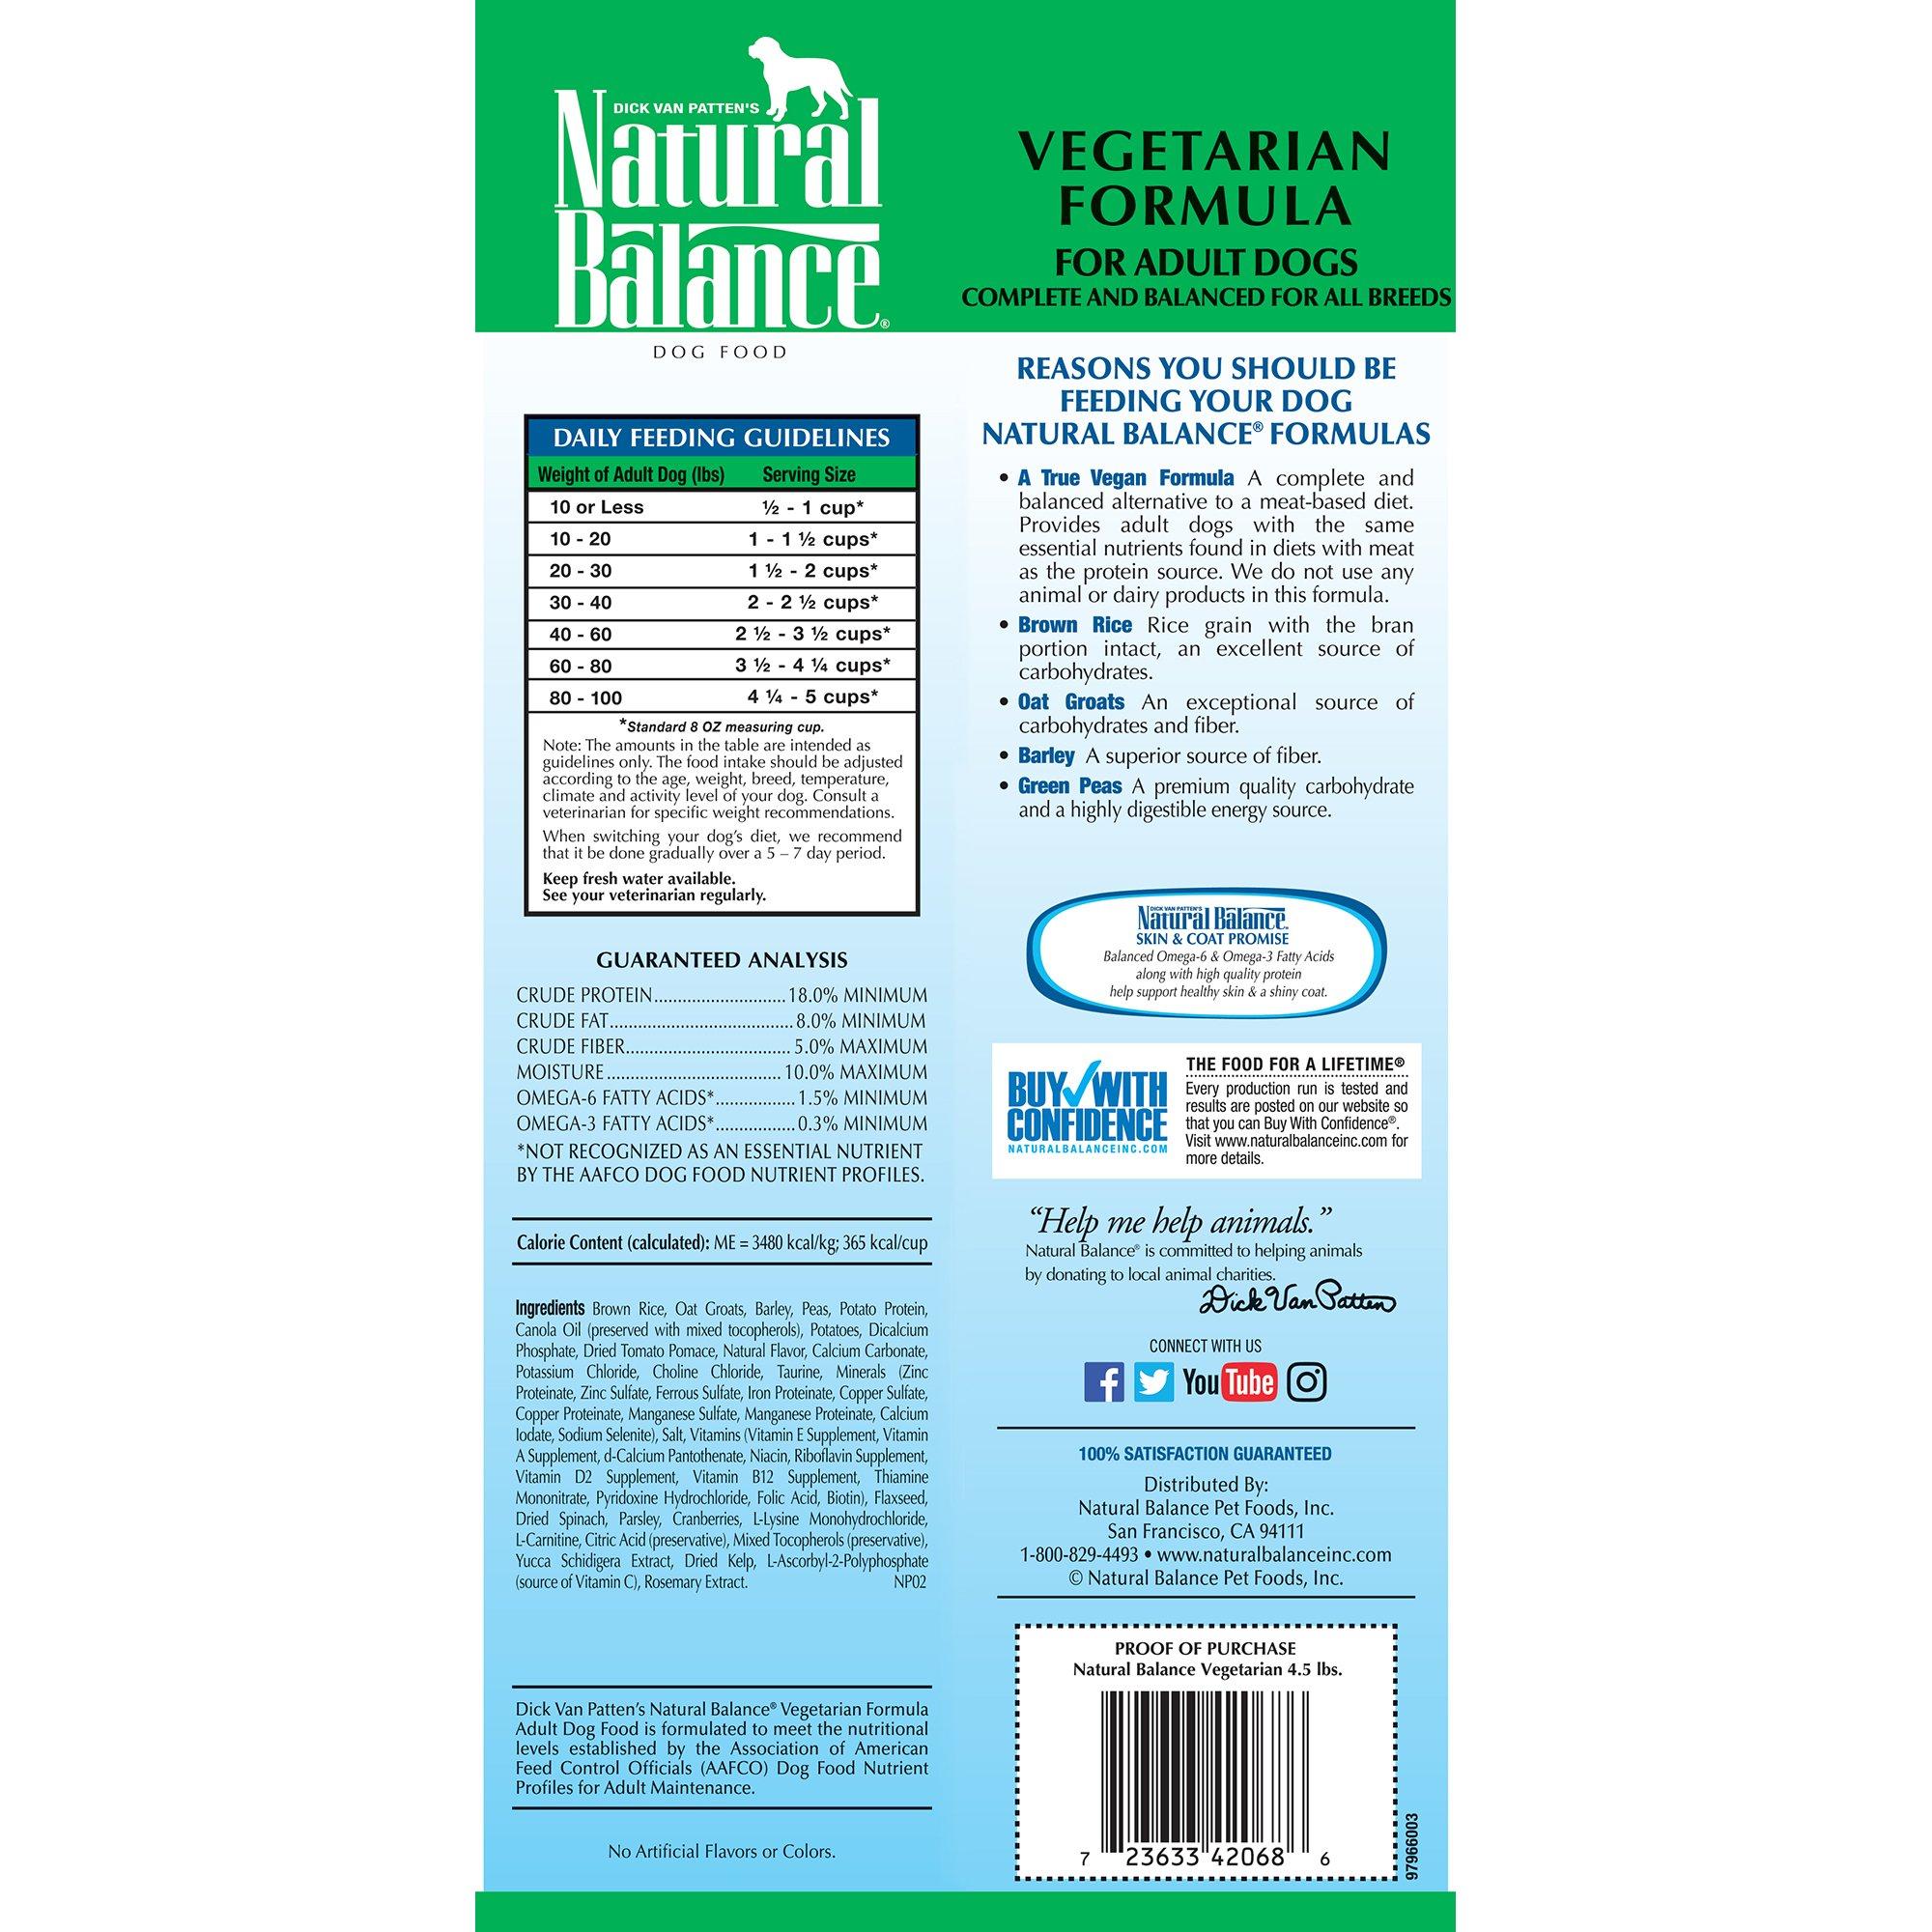 Natural Balance Vegetarian Formula Dry Dog Food, 4.5-Pound by Natural Balance (Image #2)